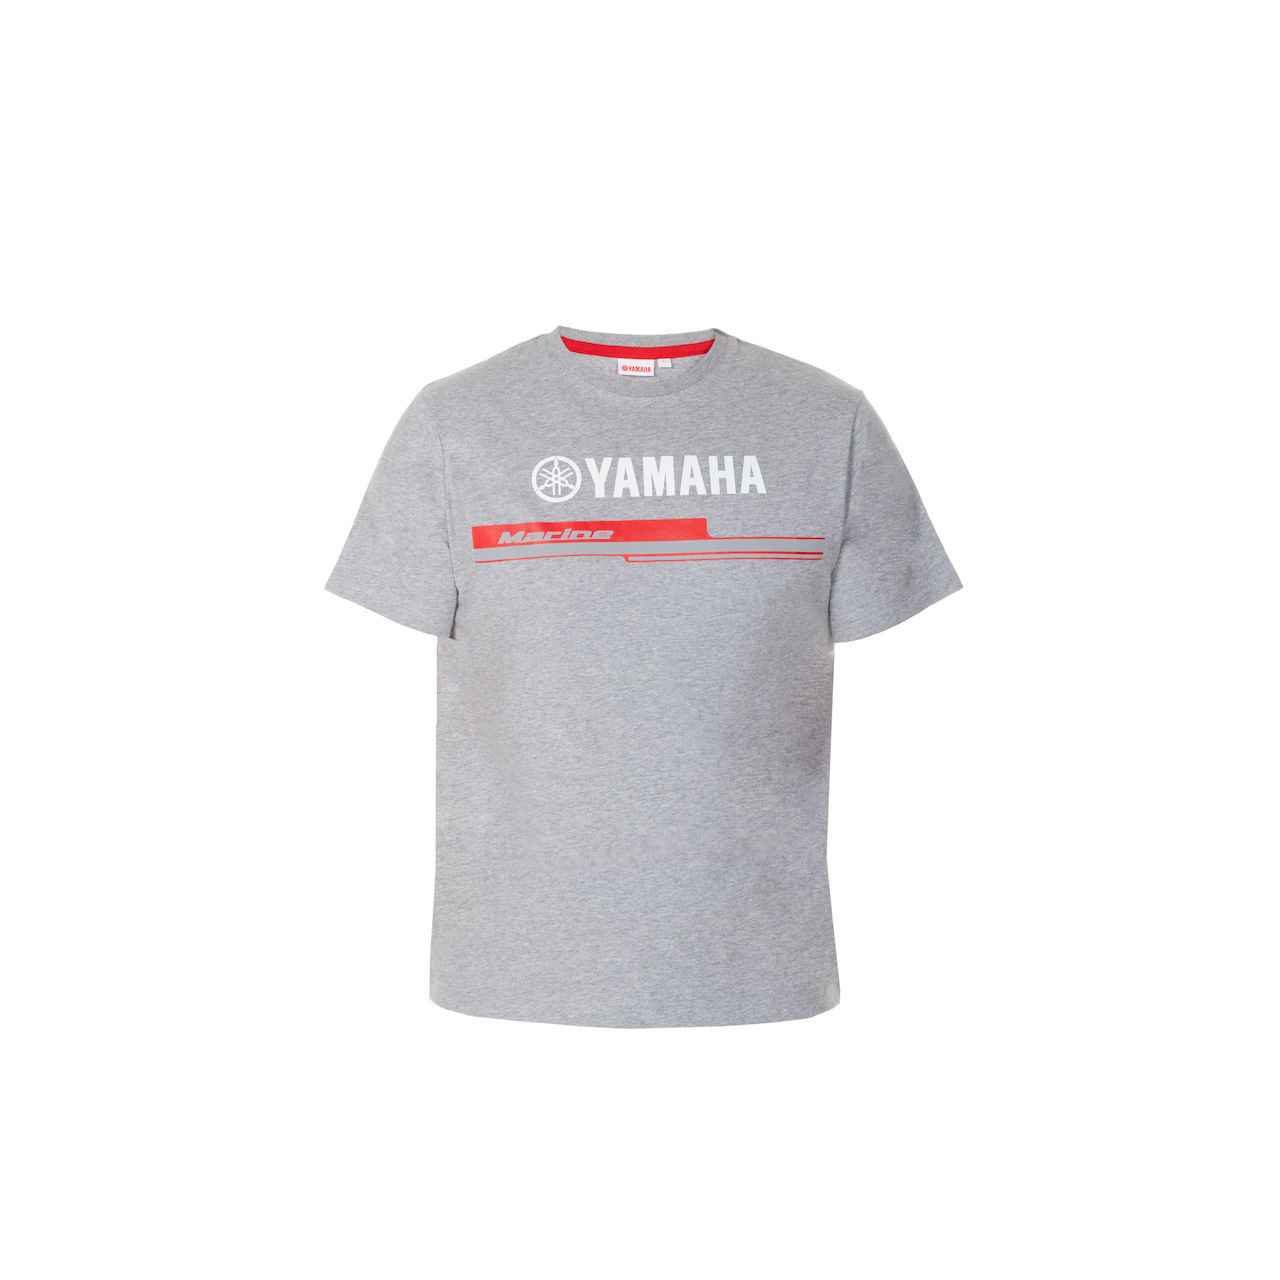 YAMAHA T-shirt homme Marine 2017